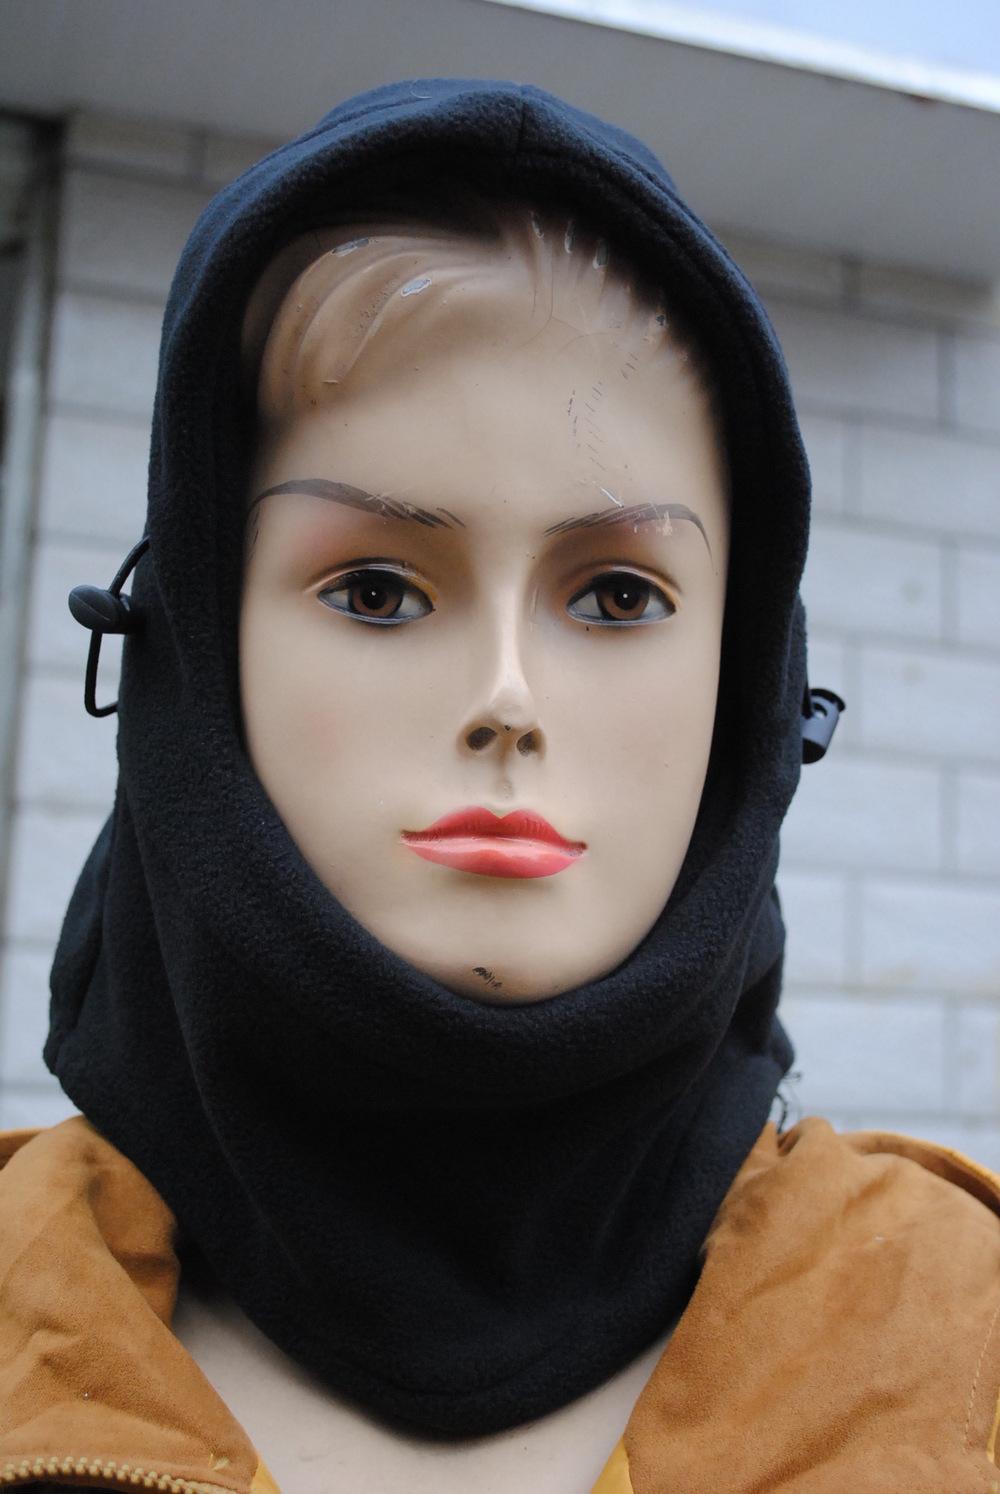 Outdoor riding windproof warm hat scarf caught balaclavas unisex rider protection face mask cs Tiger cap caps(China (Mainland))